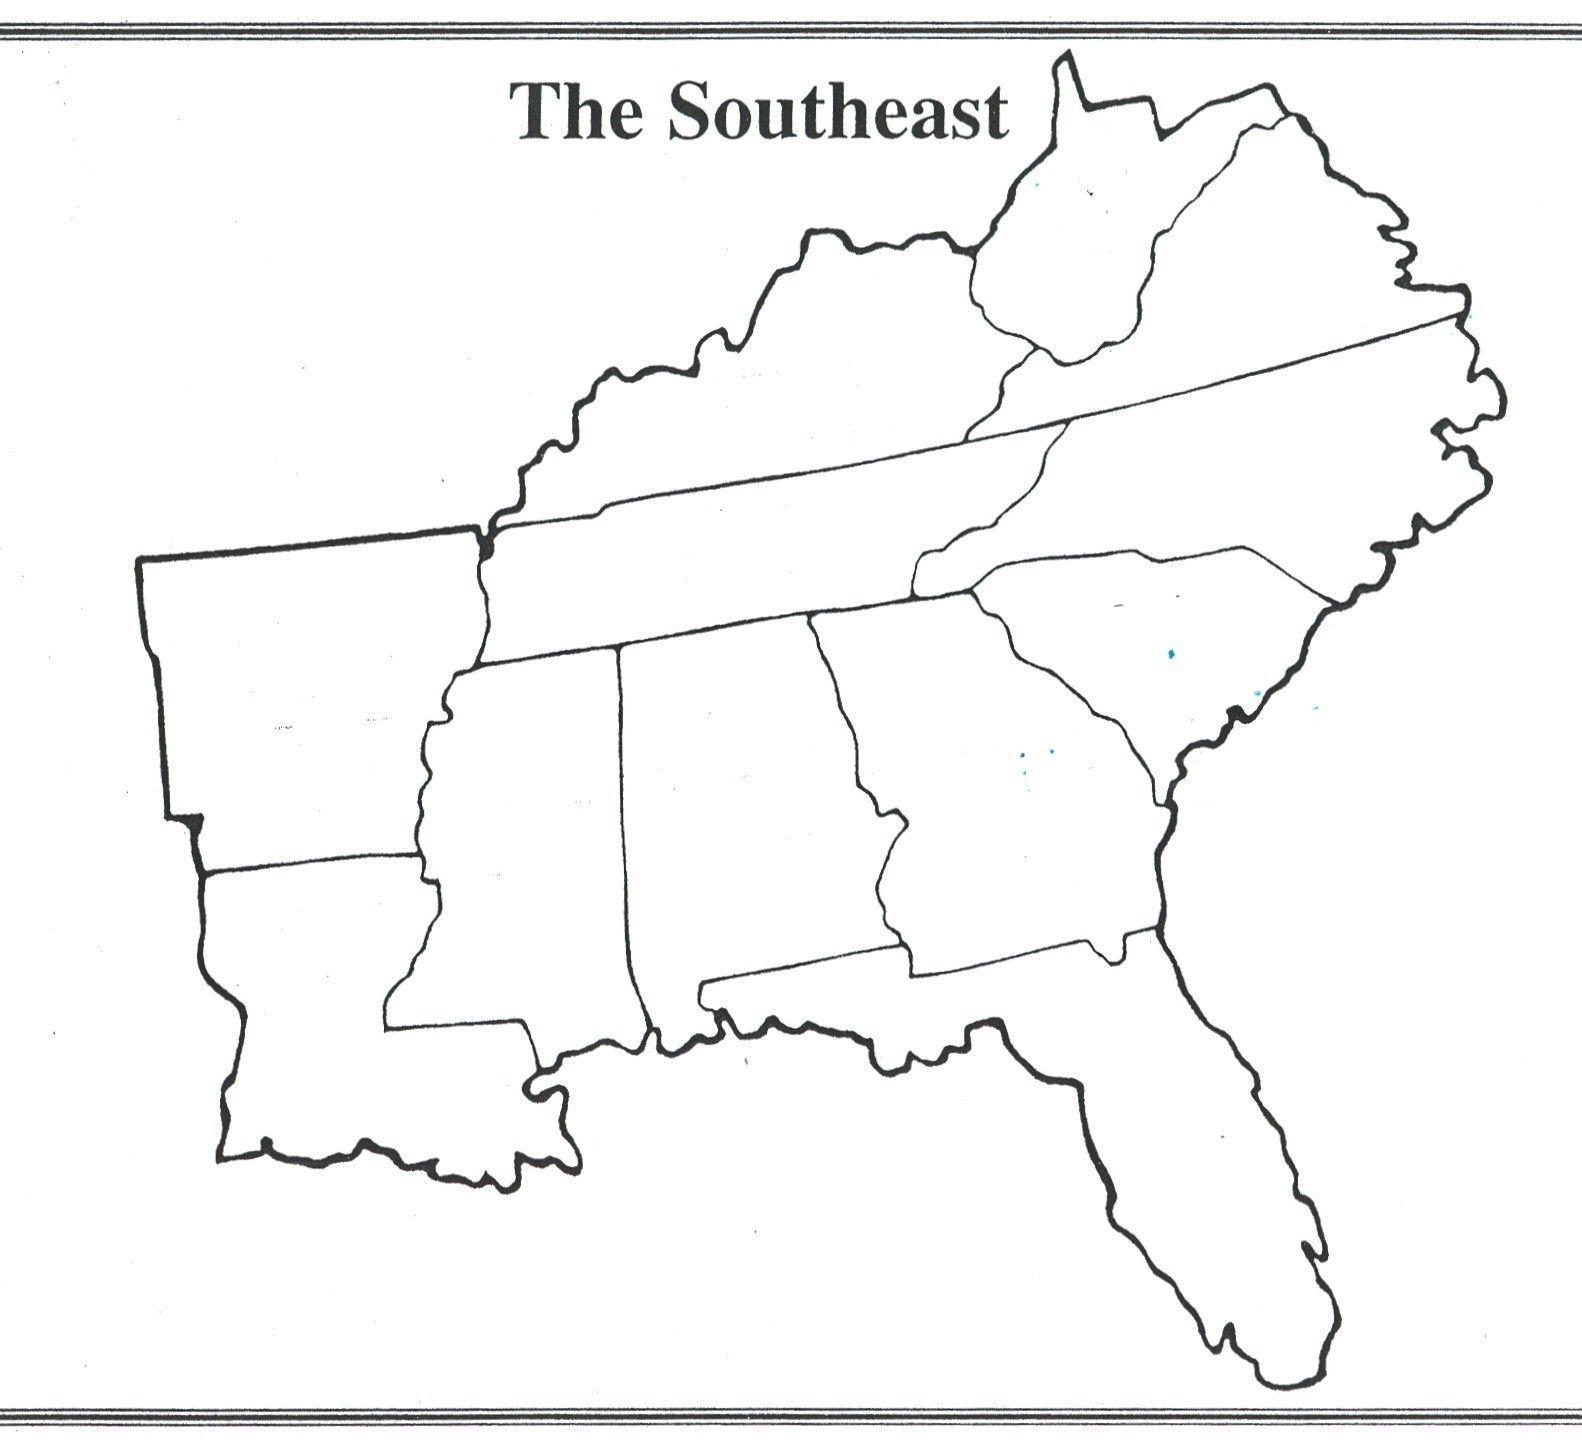 eastern united states map quiz Interesting Blank Us Map Quiz Printable South Eastern States And